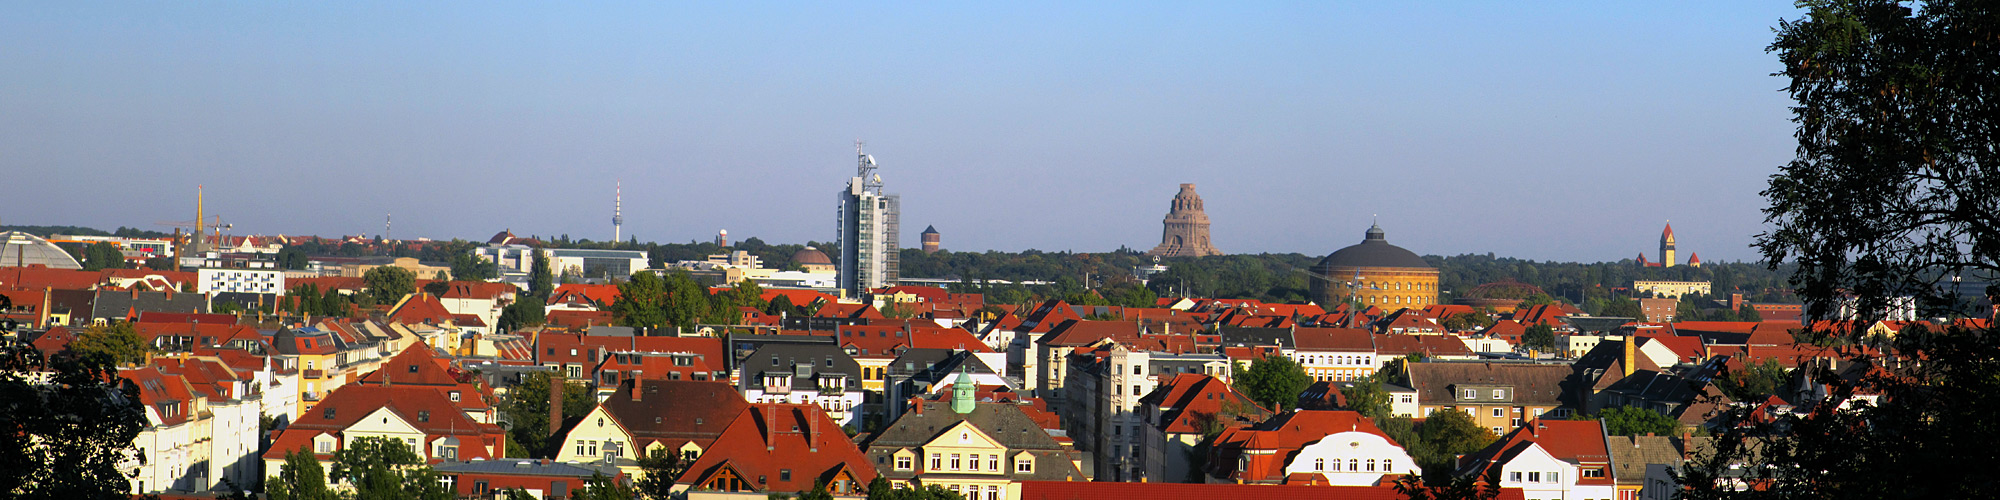 Leipzig - heute abend